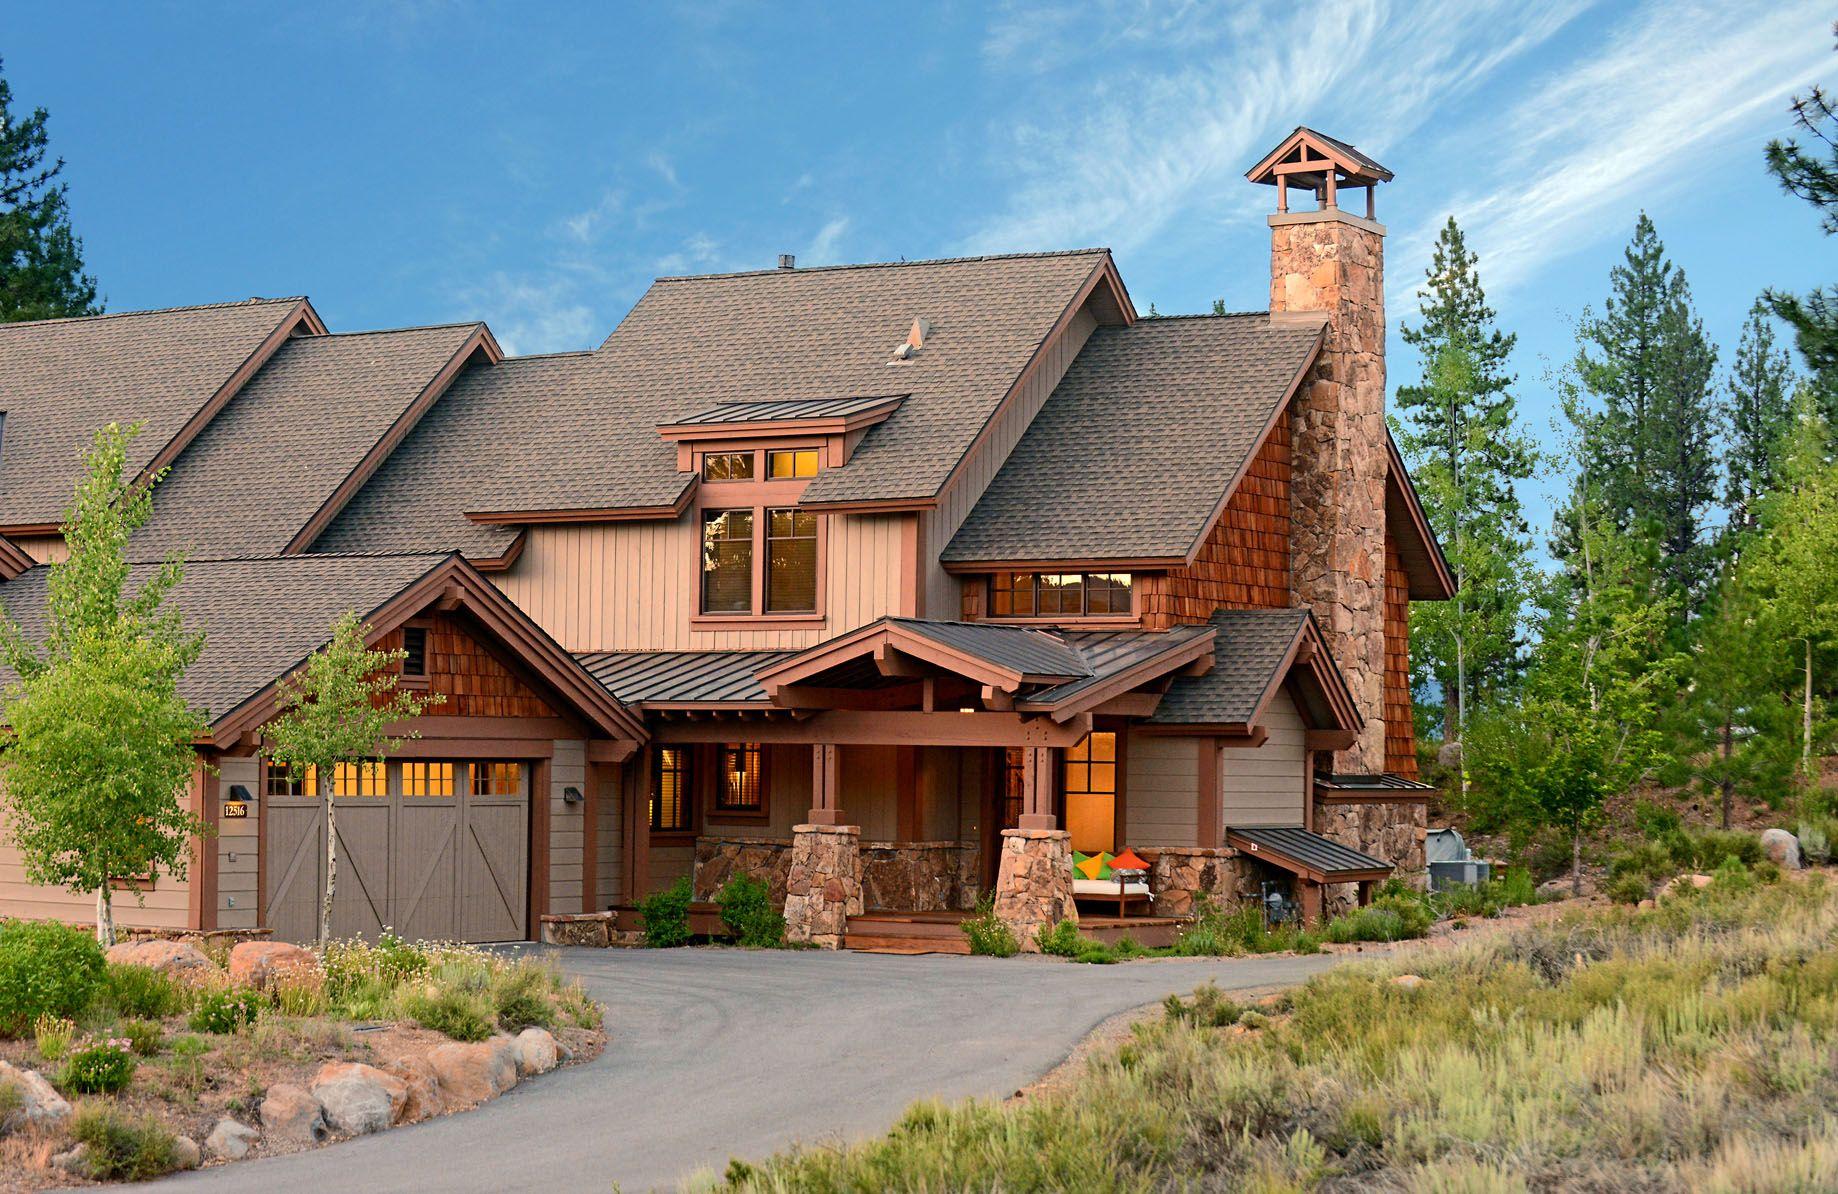 Tahoe Exclusive Vacation Rental Luxury rentals, Luxury